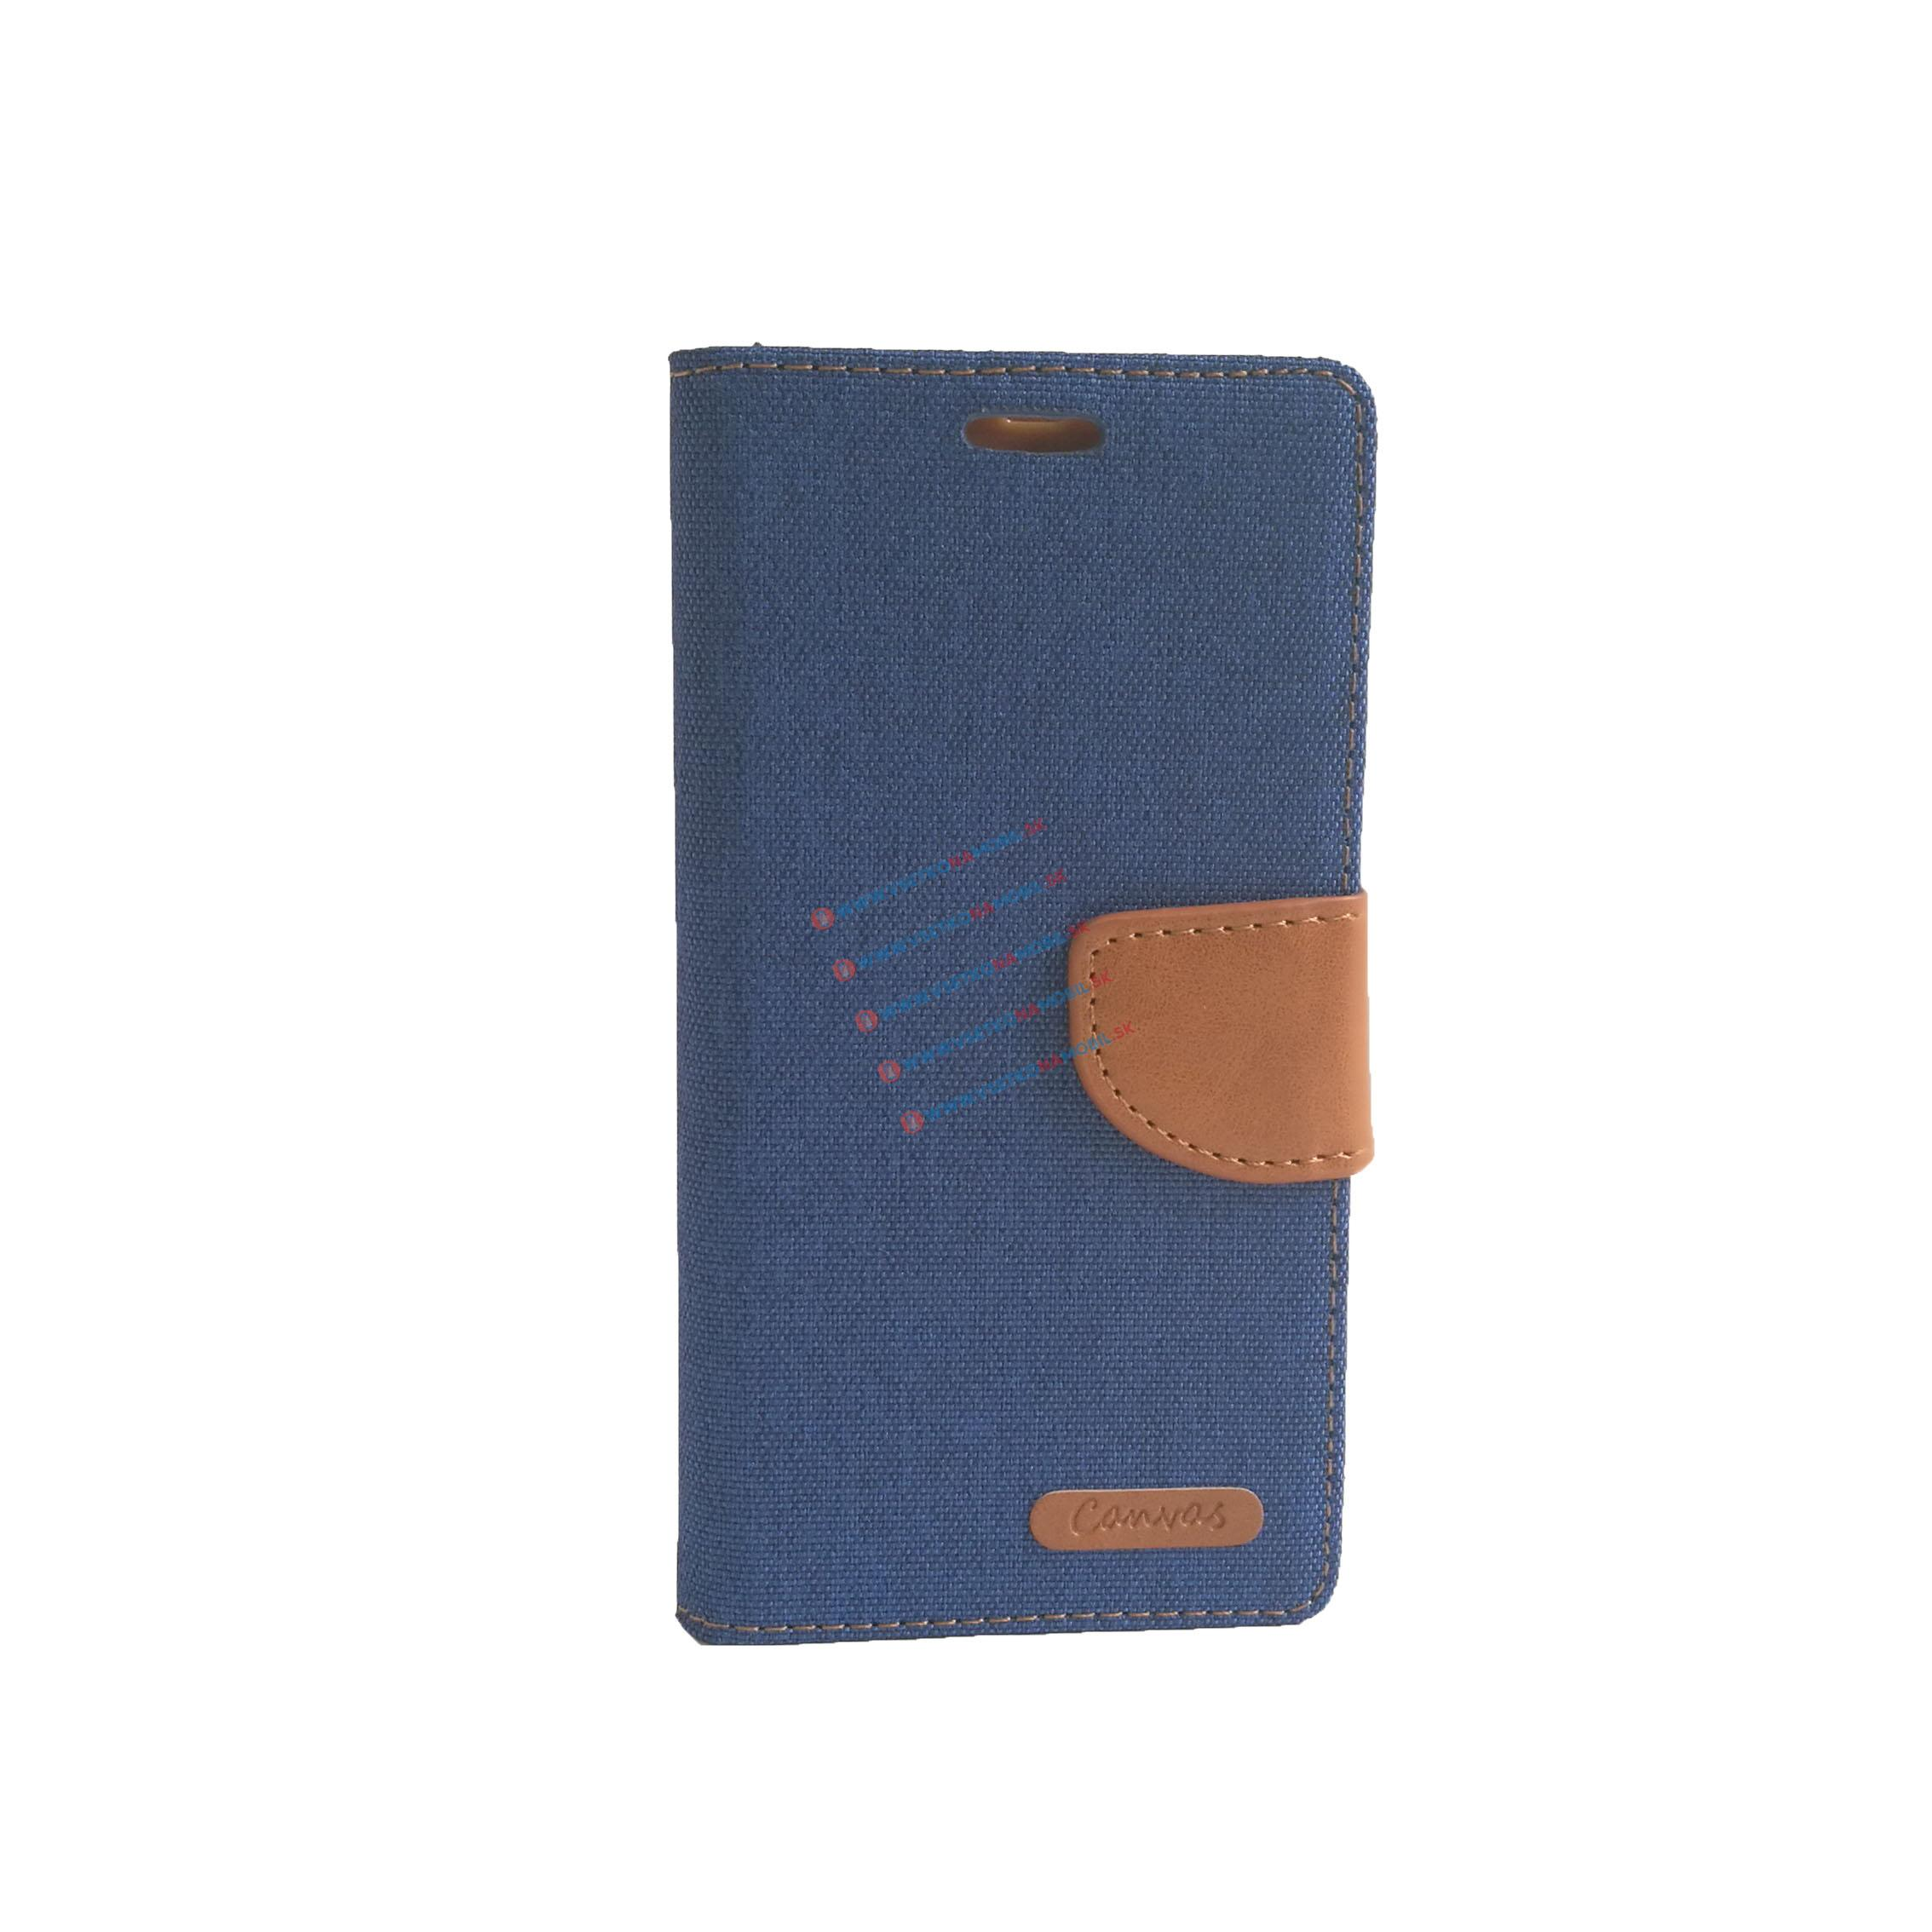 FORCELL CANVAS peňaženkové púzdro Lenovo A6000 modré